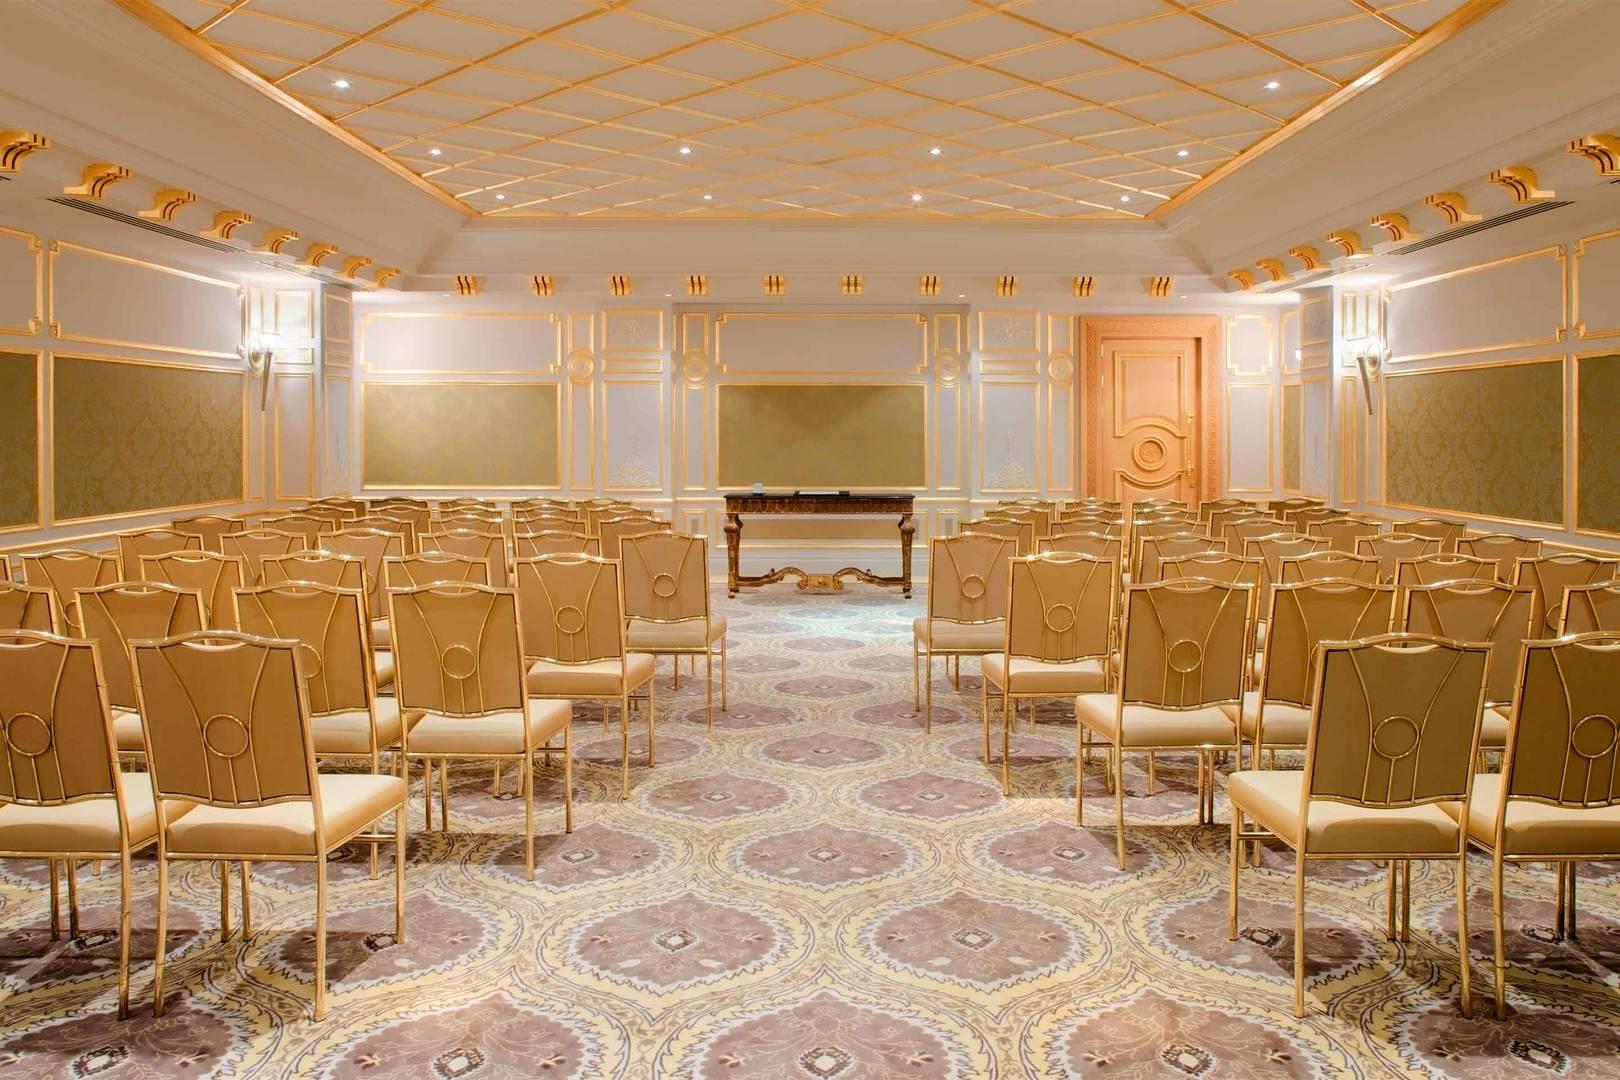 https://cdn.jumeirah.com/-/mediadh/DH/Hospitality/Jumeirah/Occasion/Dubai/Zabeel-Saray/Meeting/64_MeetingsEventsJumeirahZabeelSarayMeetingRoomTheatreSetUp64.jpg?h=1080&w=1620&hash=E4B285216DB1E9E5997DFDF2FFCED541